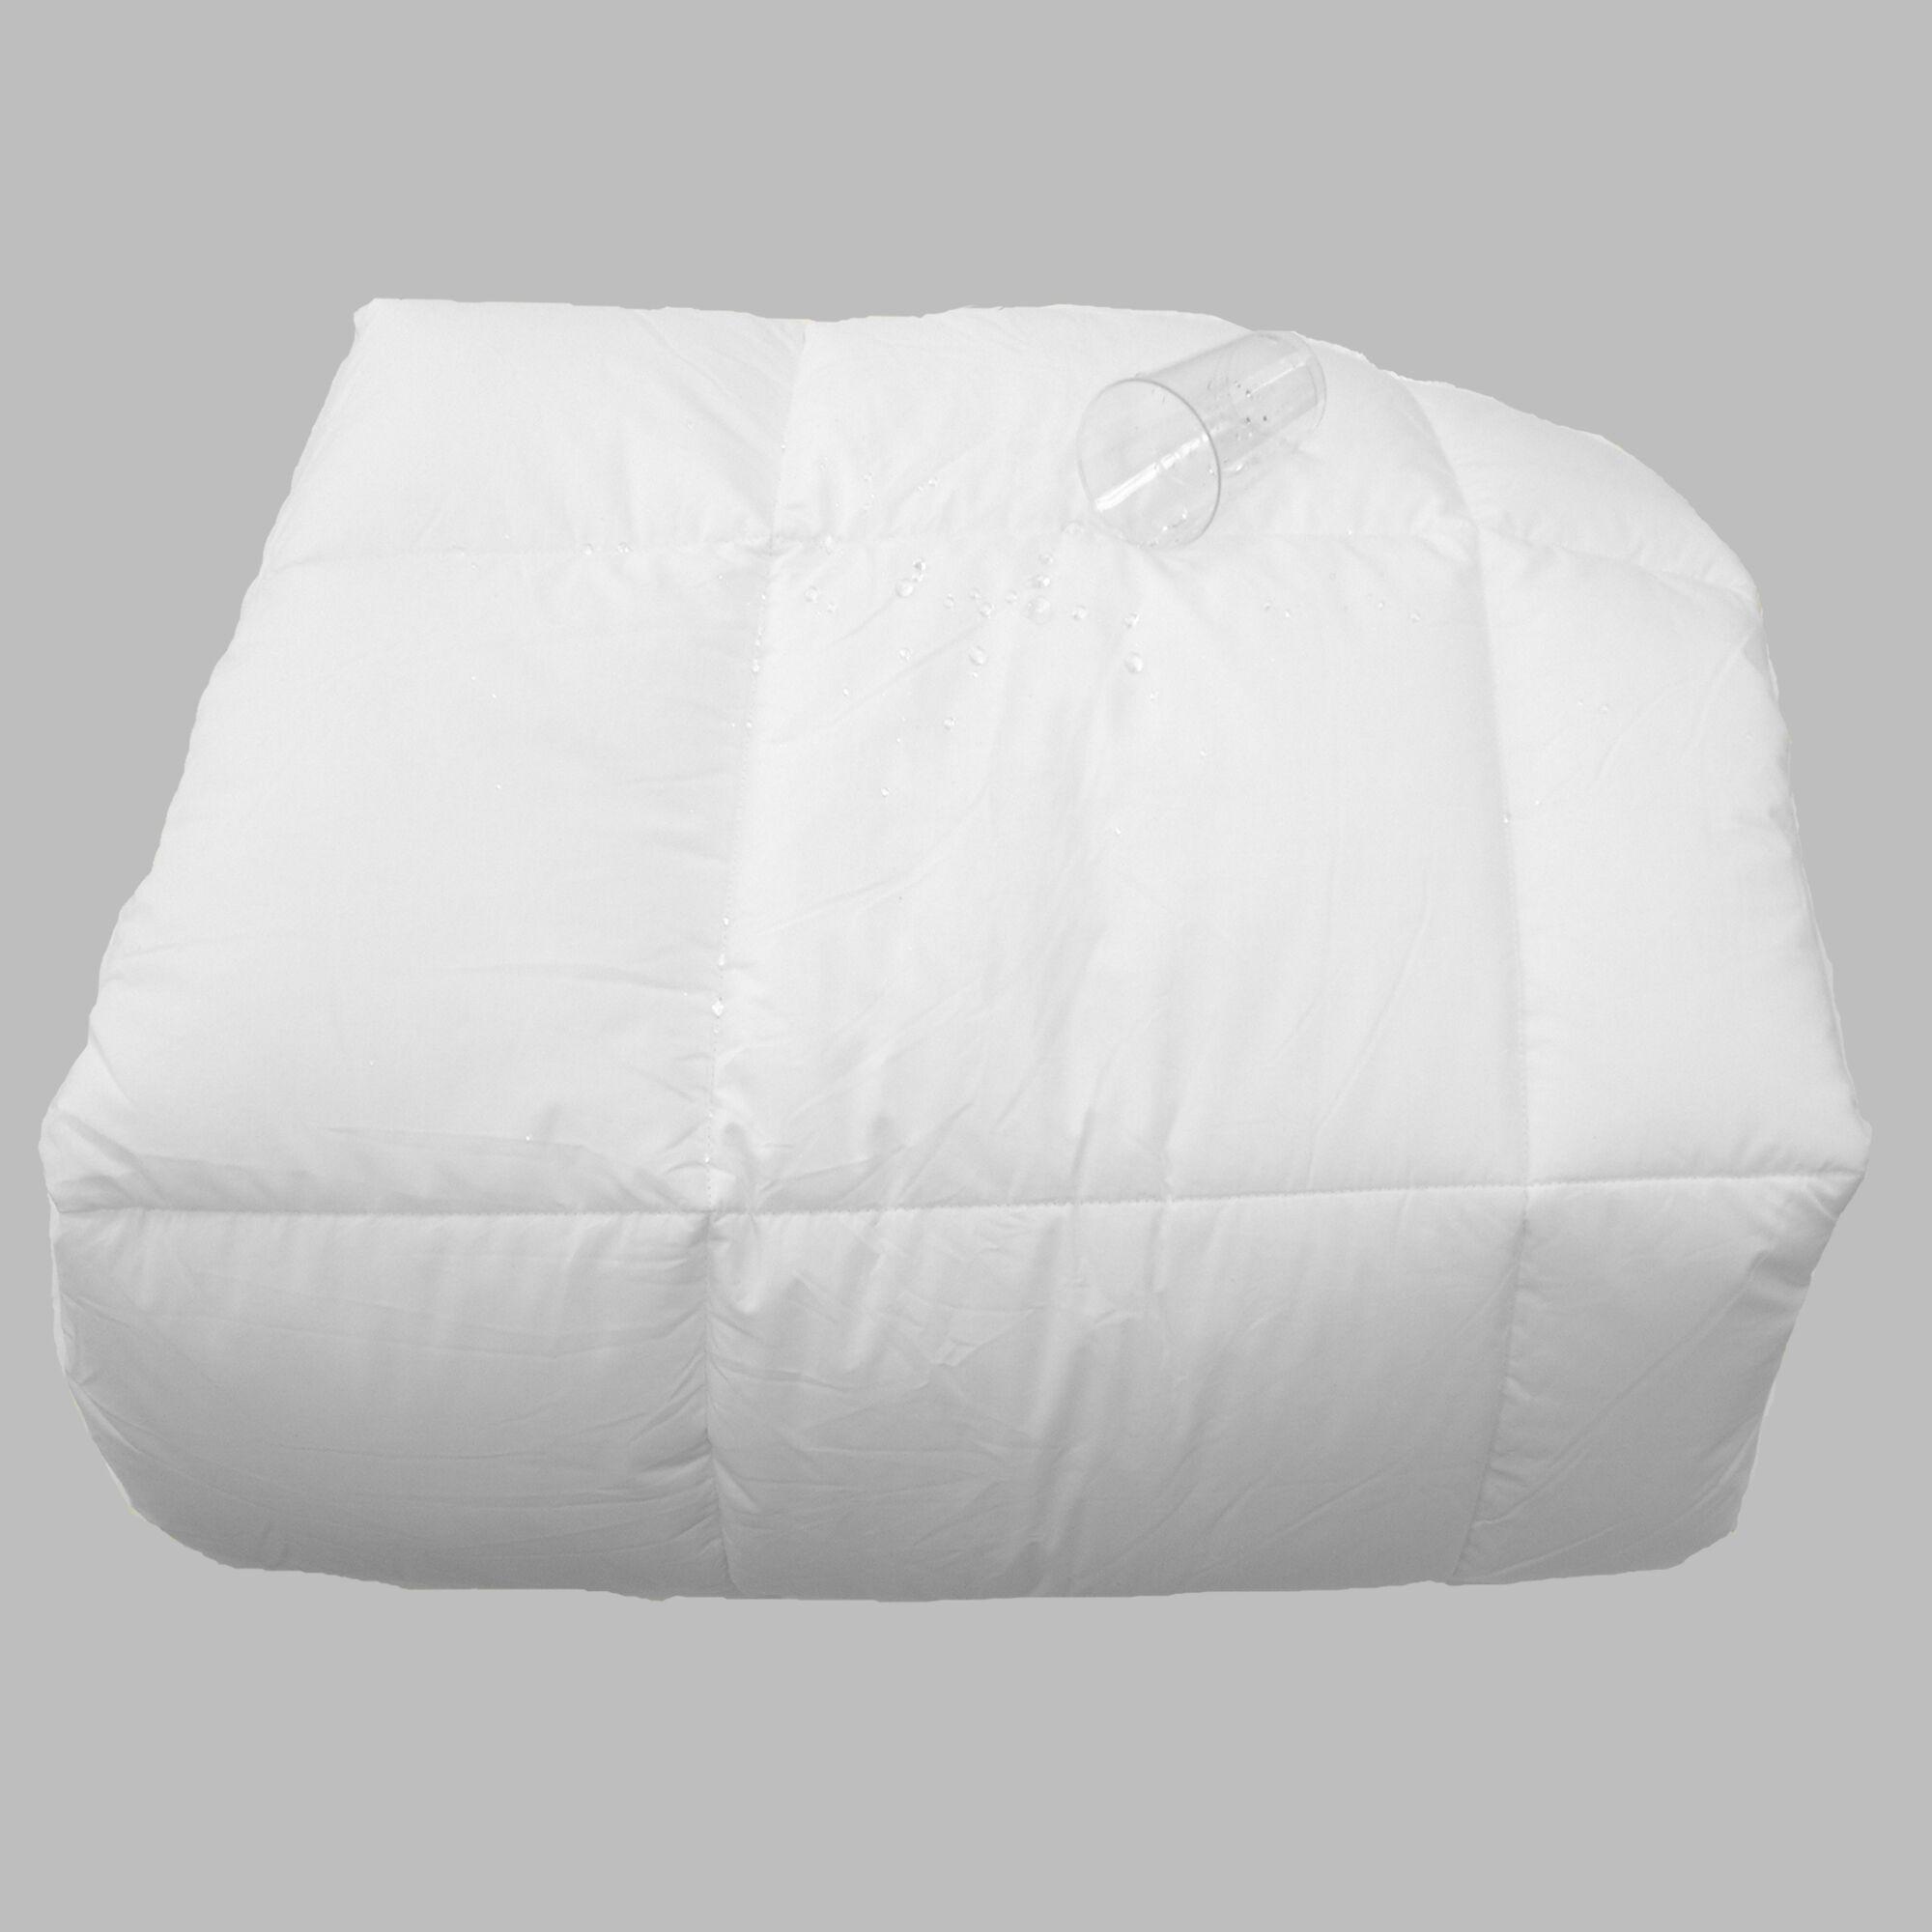 Nanofibre Midweight Down Alternative Comforter Size: Full/Queen